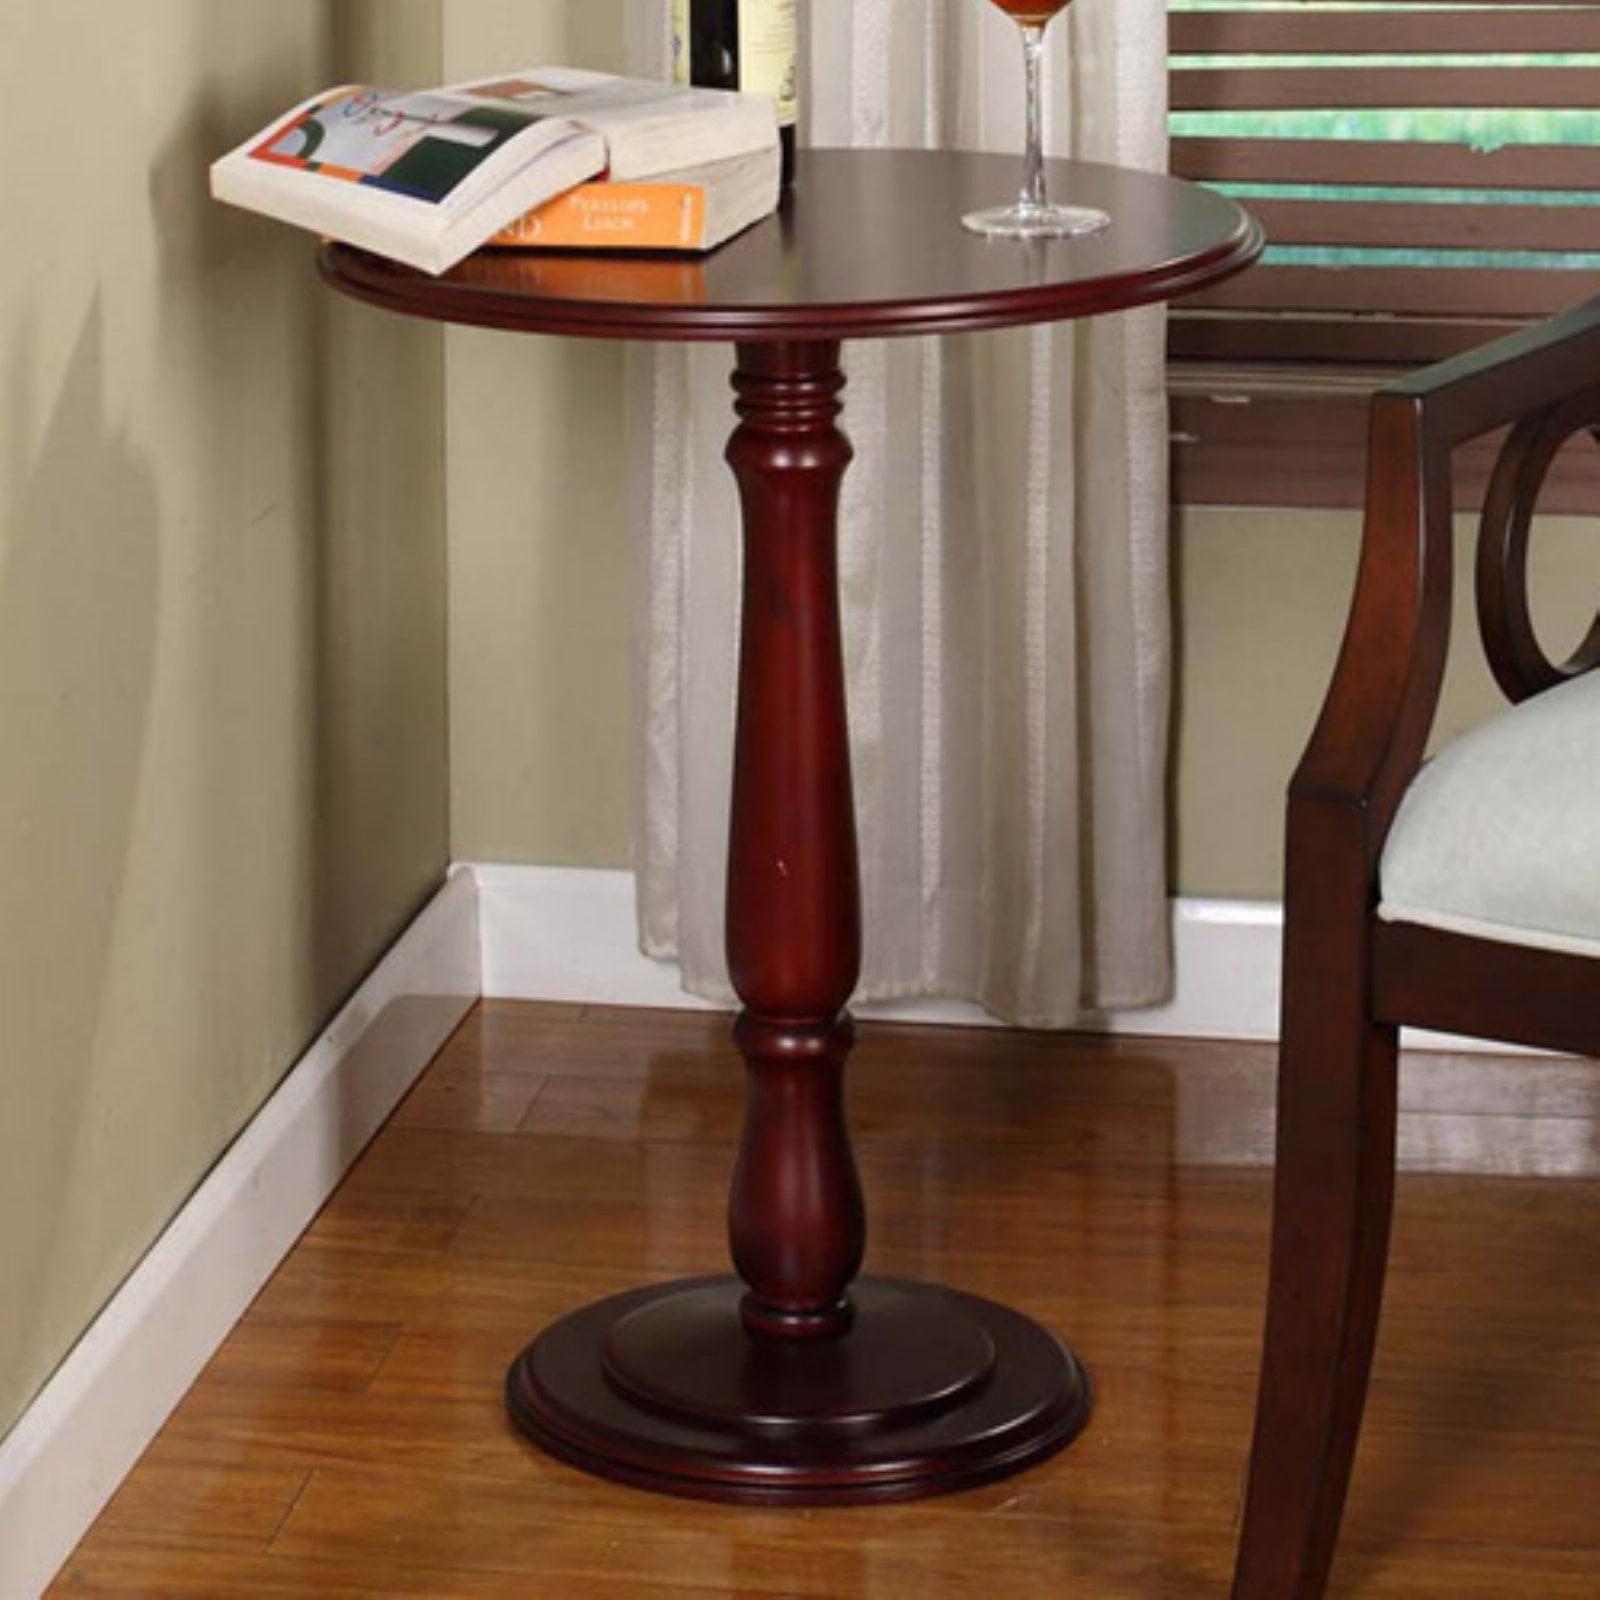 K & B Furniture Plant Stand - Cherry